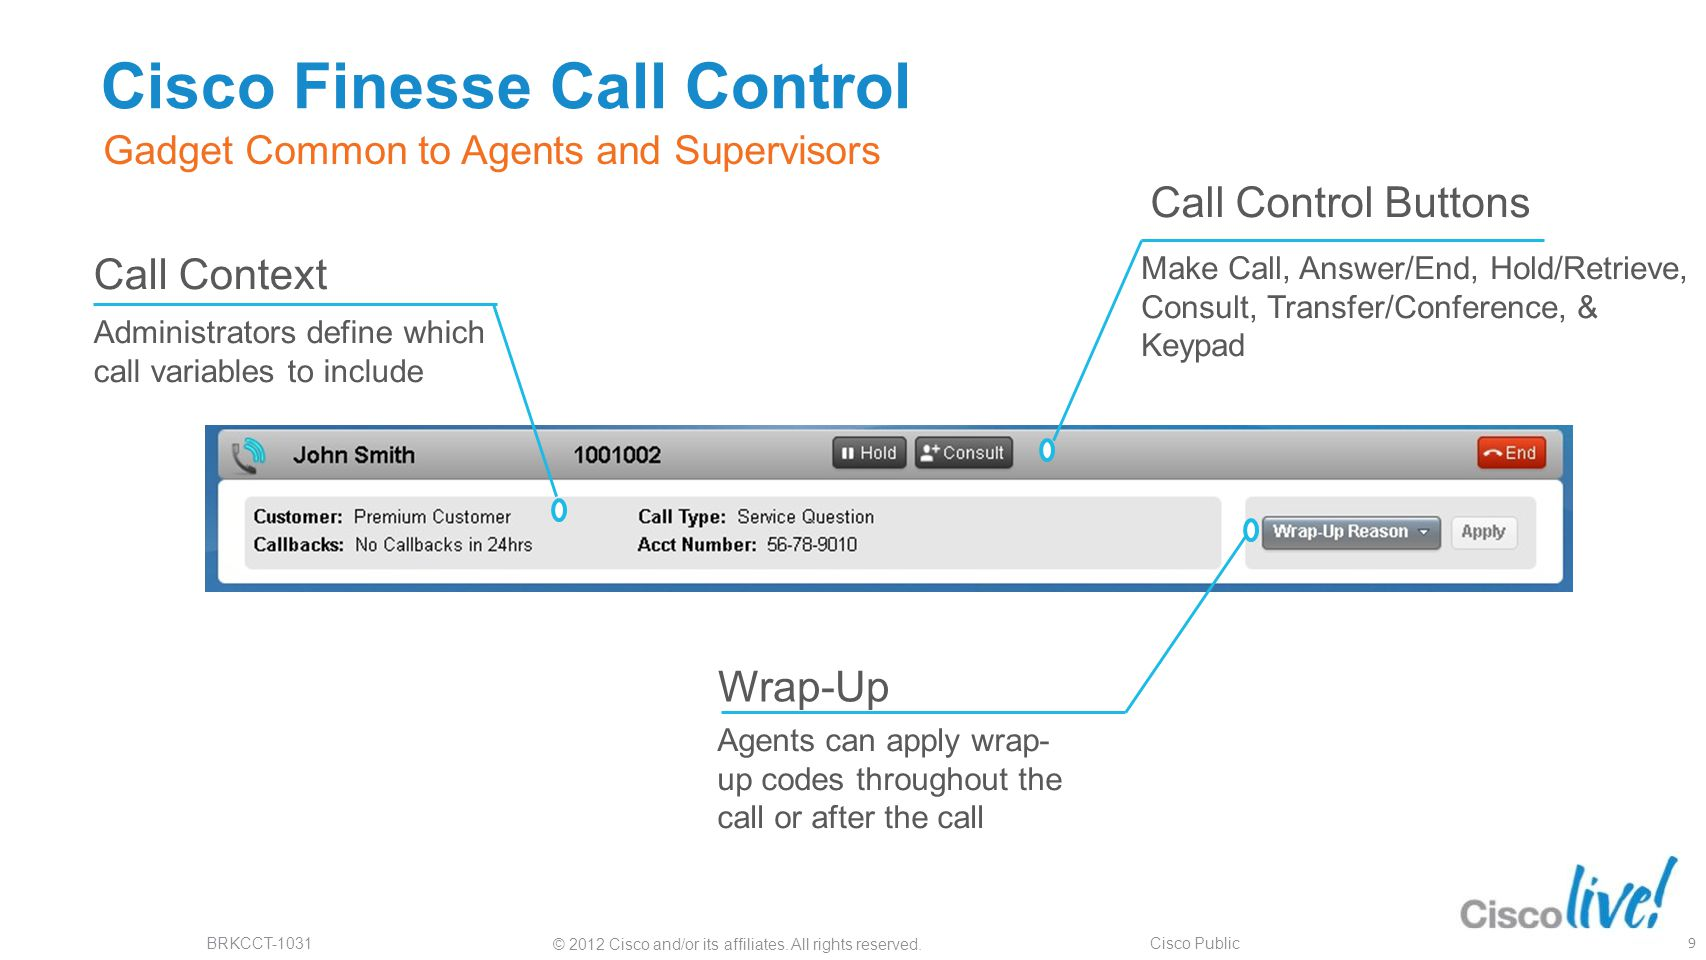 Cisco Finesse Call Control